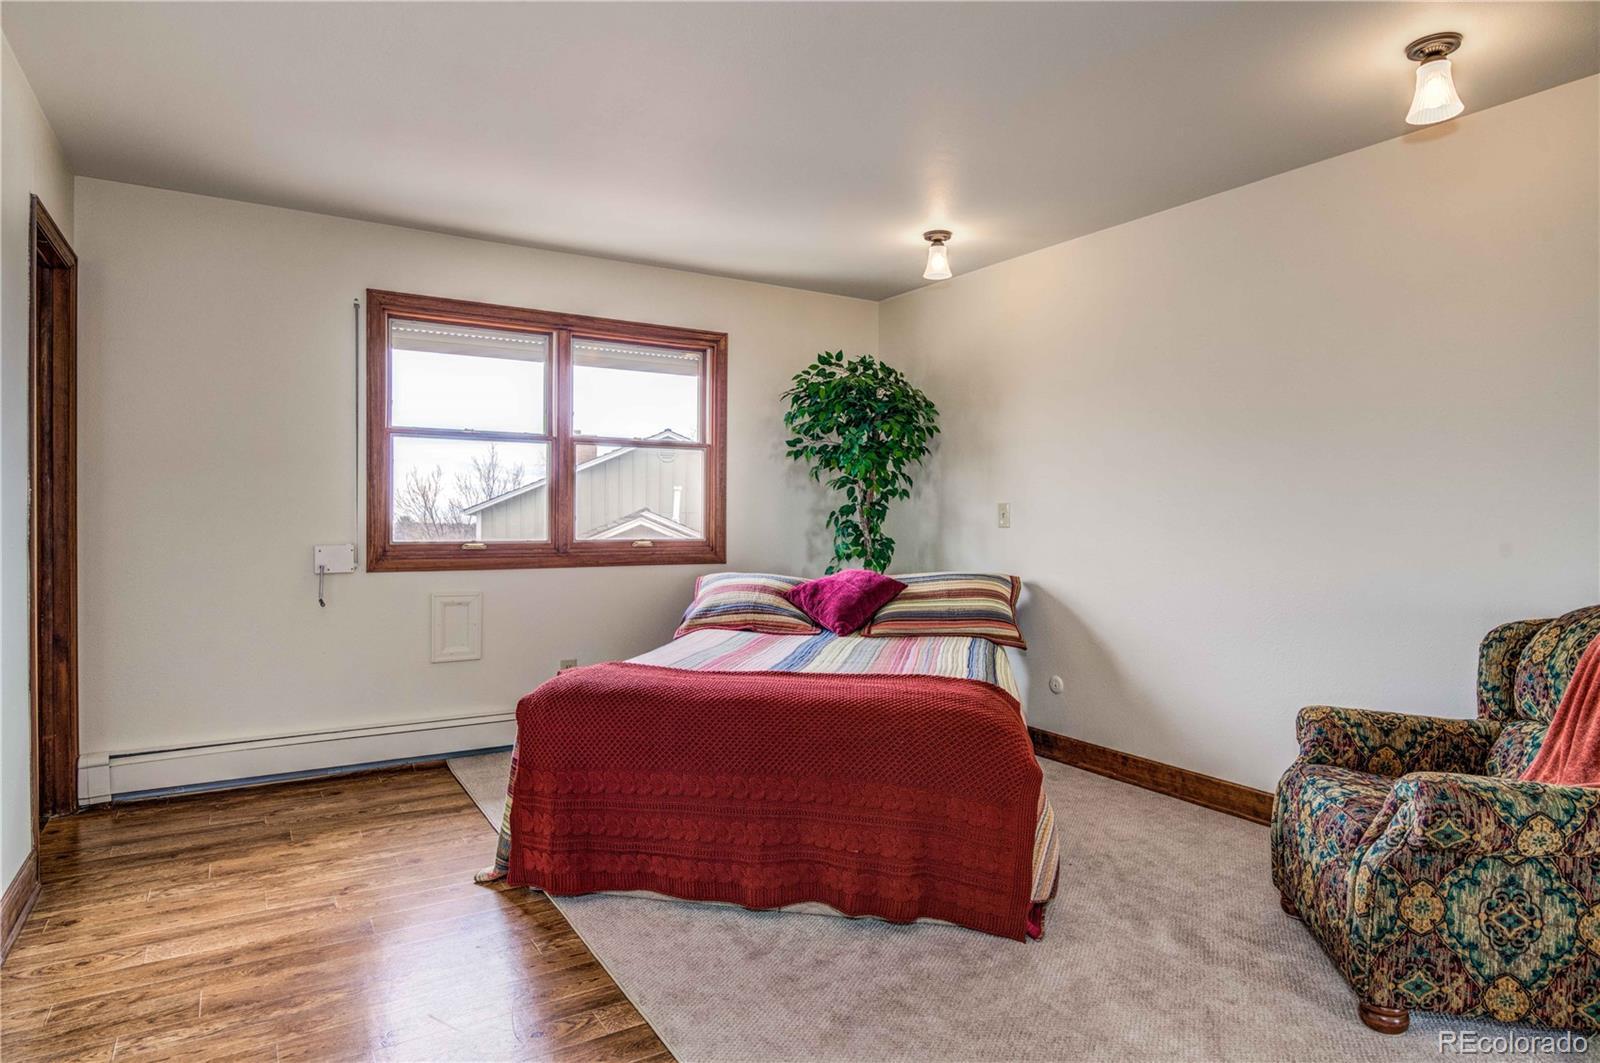 MLS# 5539974 - 17 - 5505 Saddle Rock Place, Colorado Springs, CO 80918